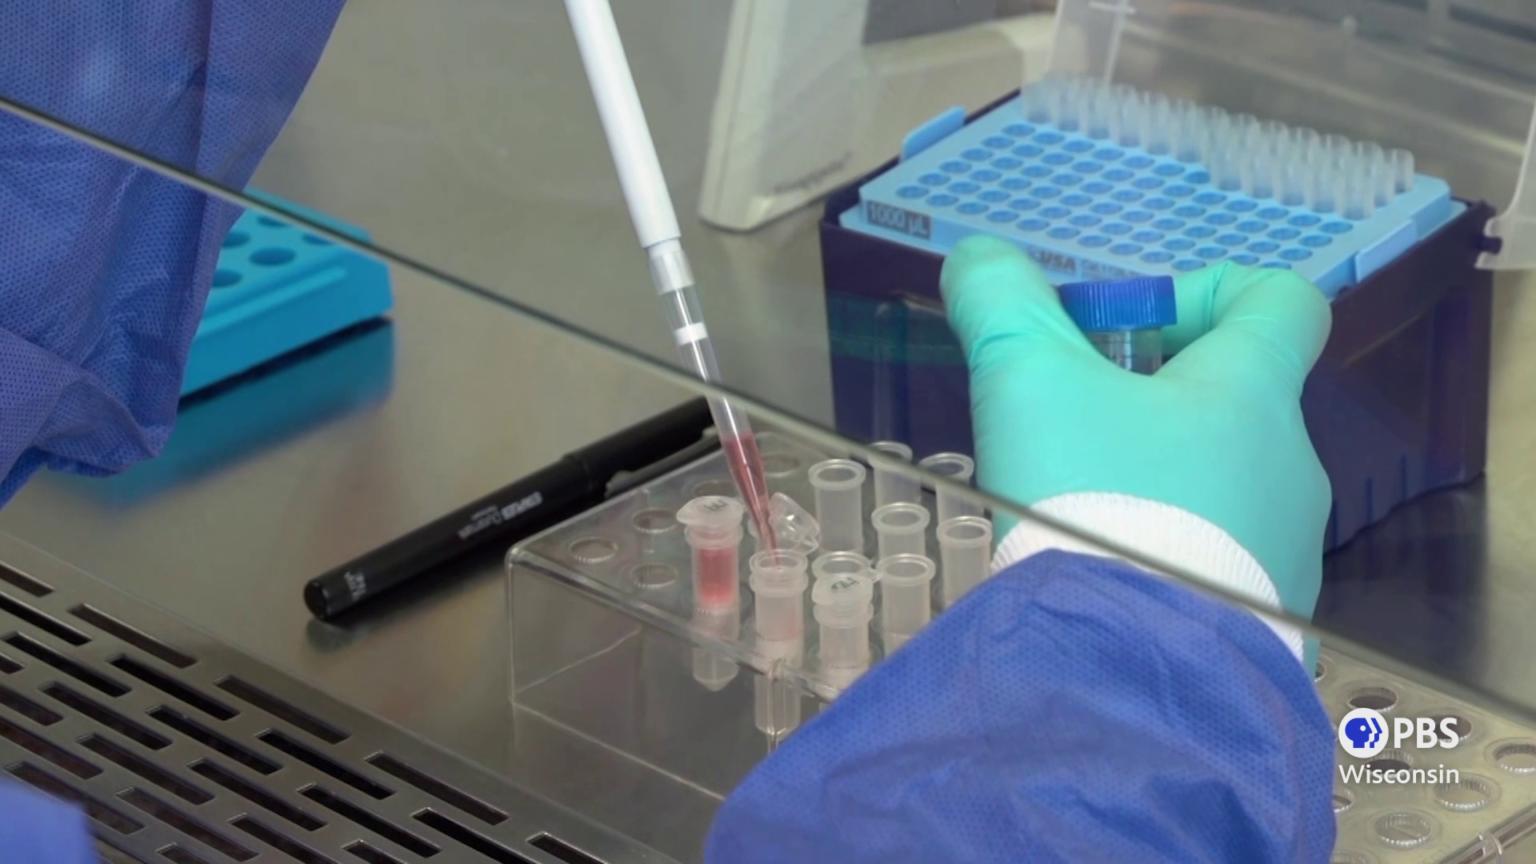 scientist's hands pipette liquid into viles